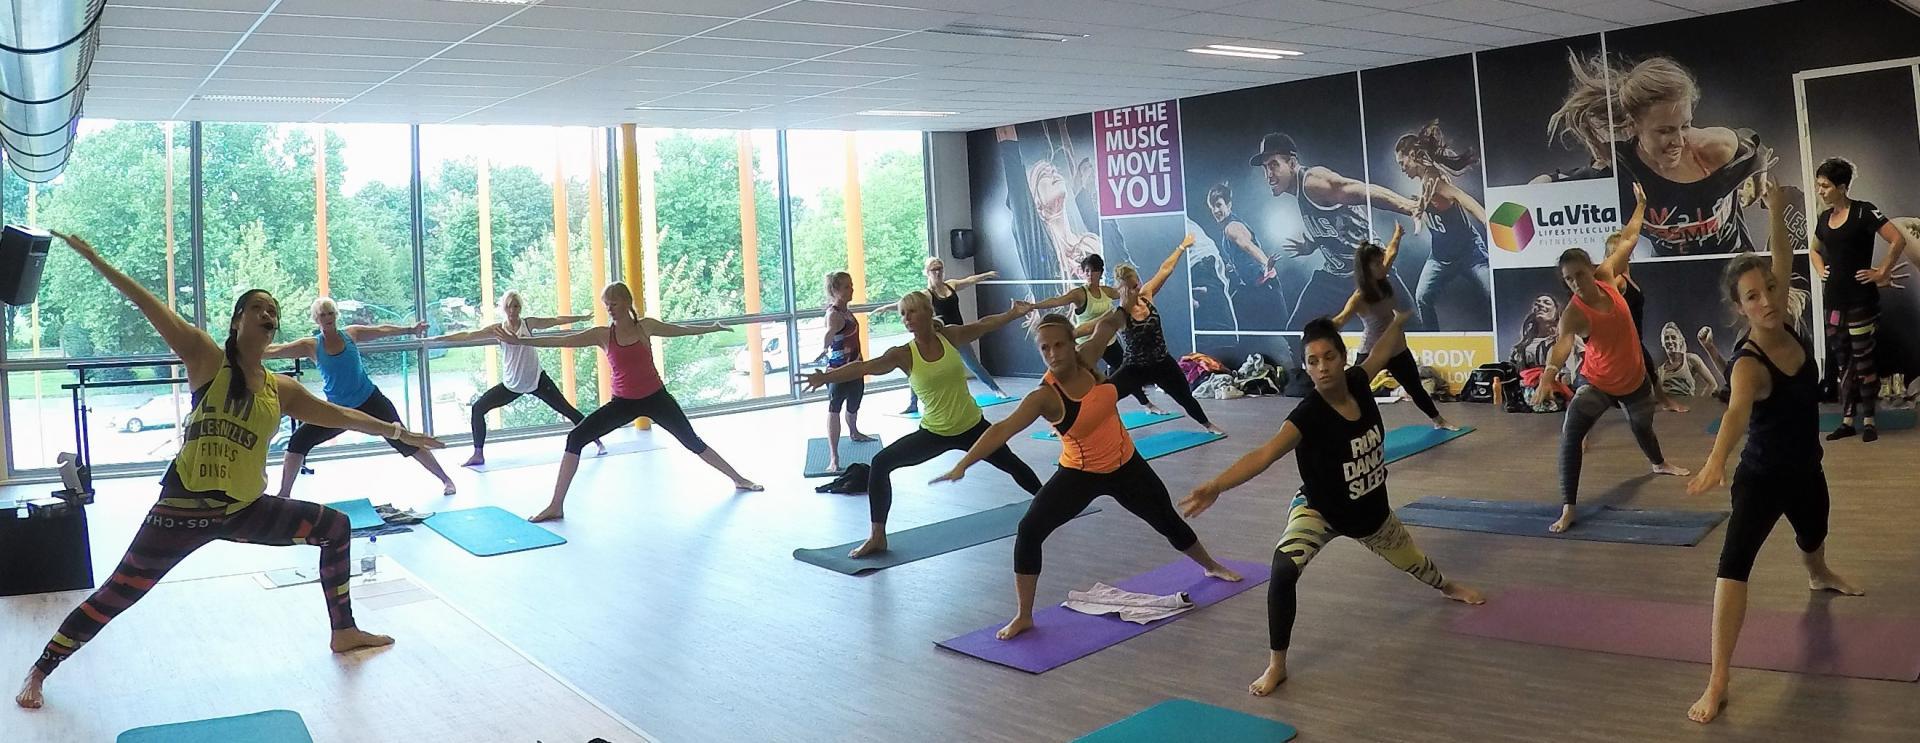 Bodybalance opleiding augustus 2016